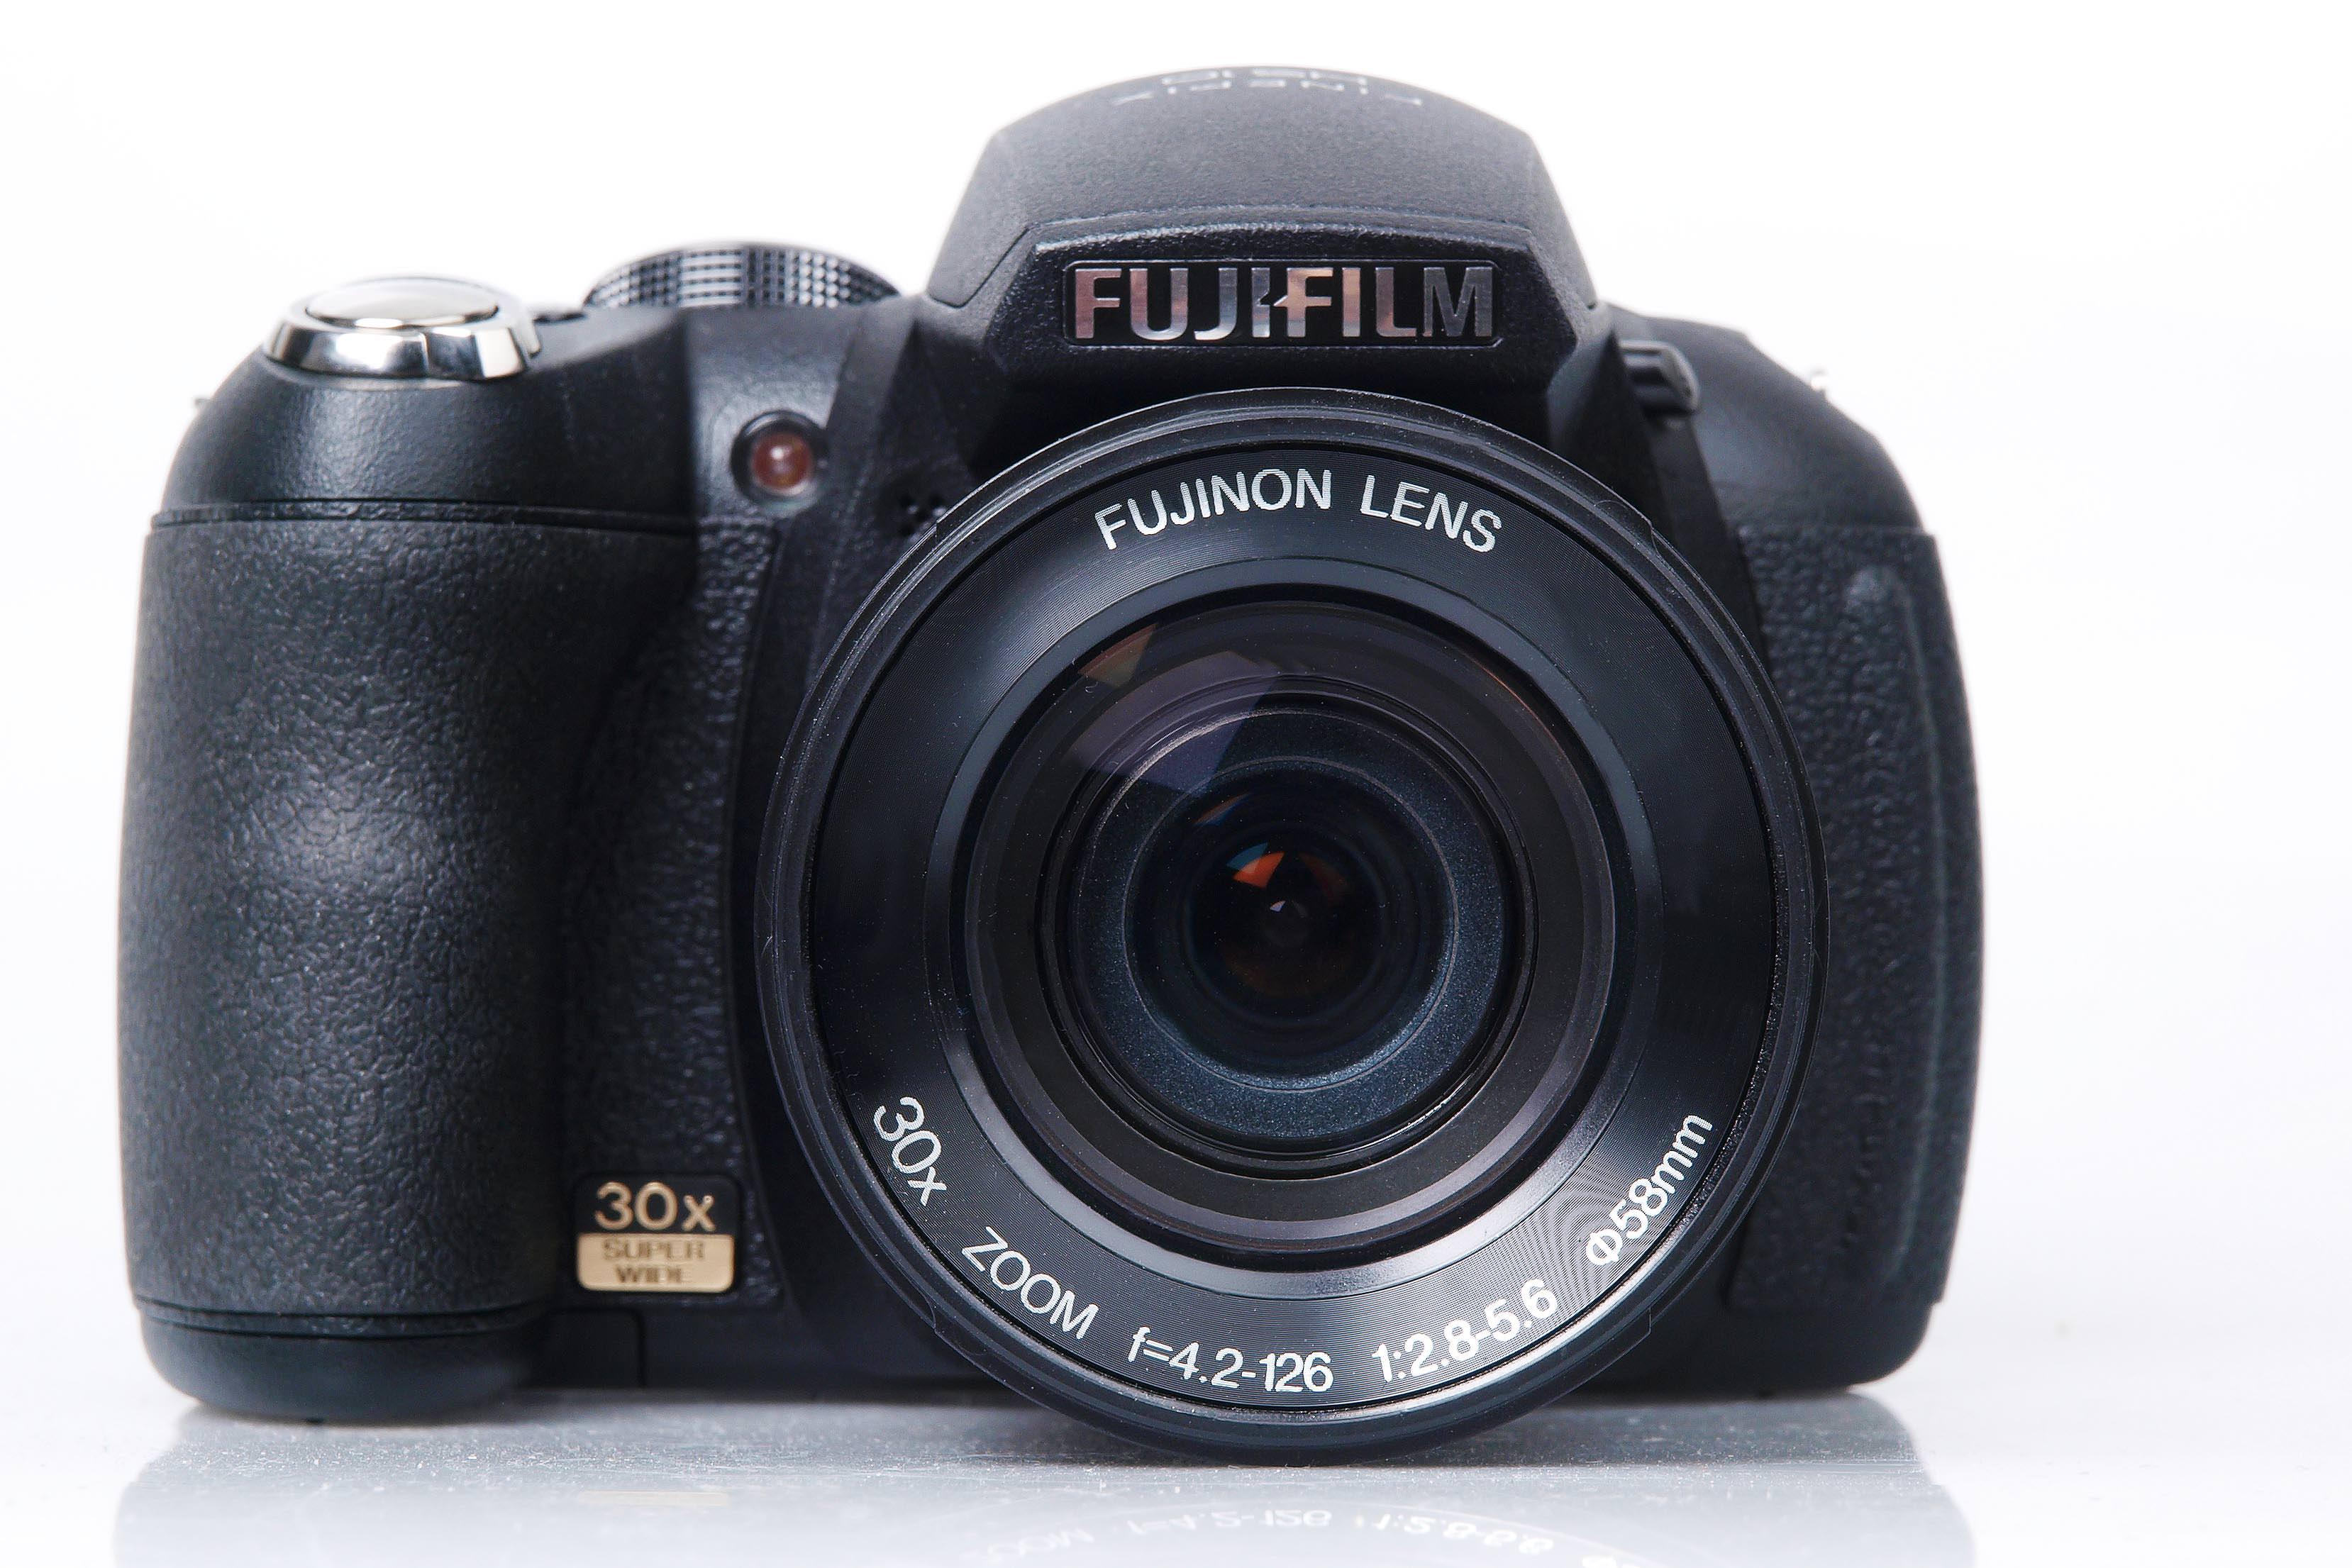 http://www.ephotozine.com/articles/fujifilm-finepix-hs10-13479/images/fujifilm_finepix_hs10_front.jpg